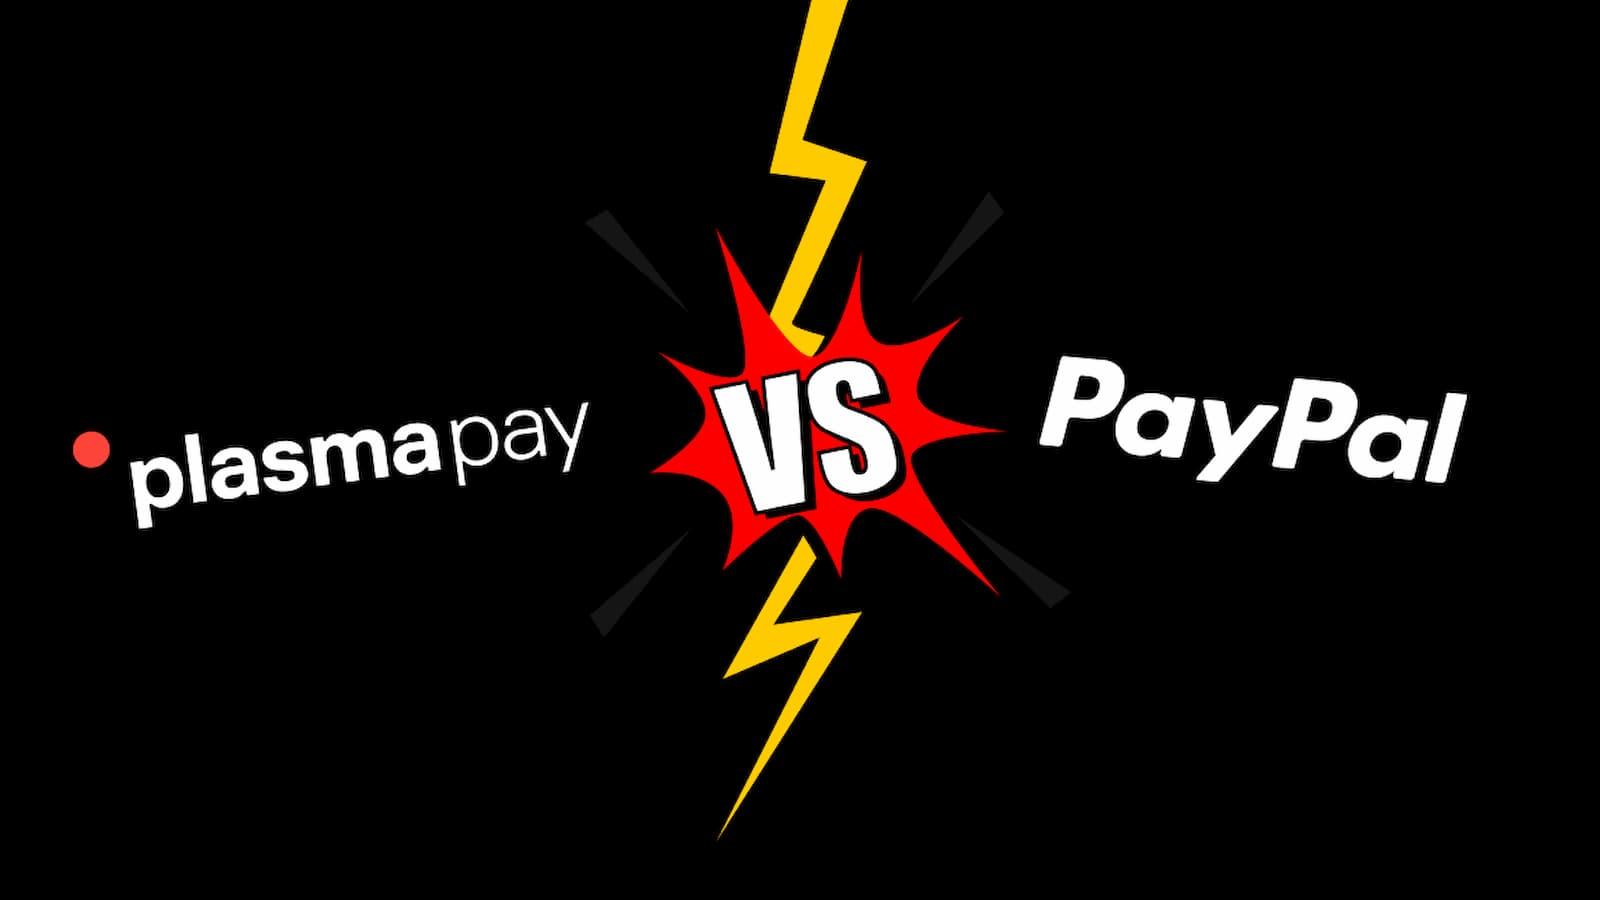 plasmapay vs paypal